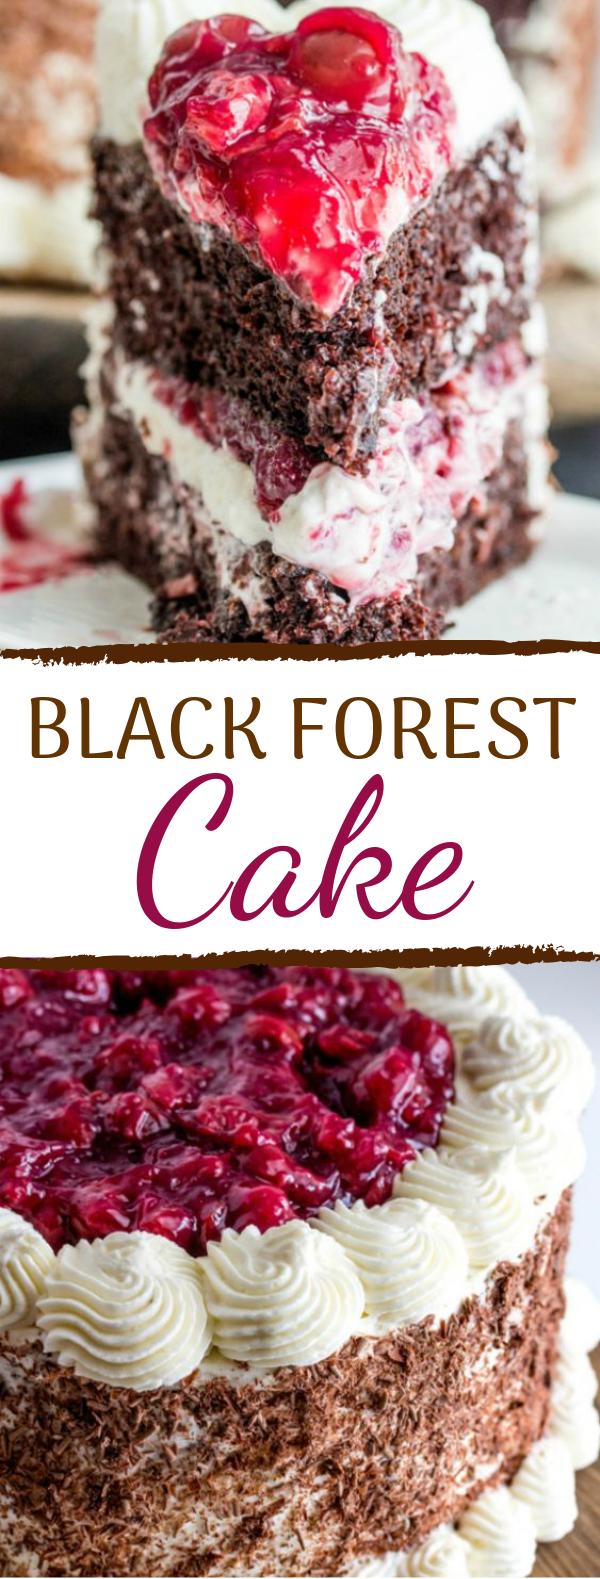 Black Forest Cake #chocolate #dessert